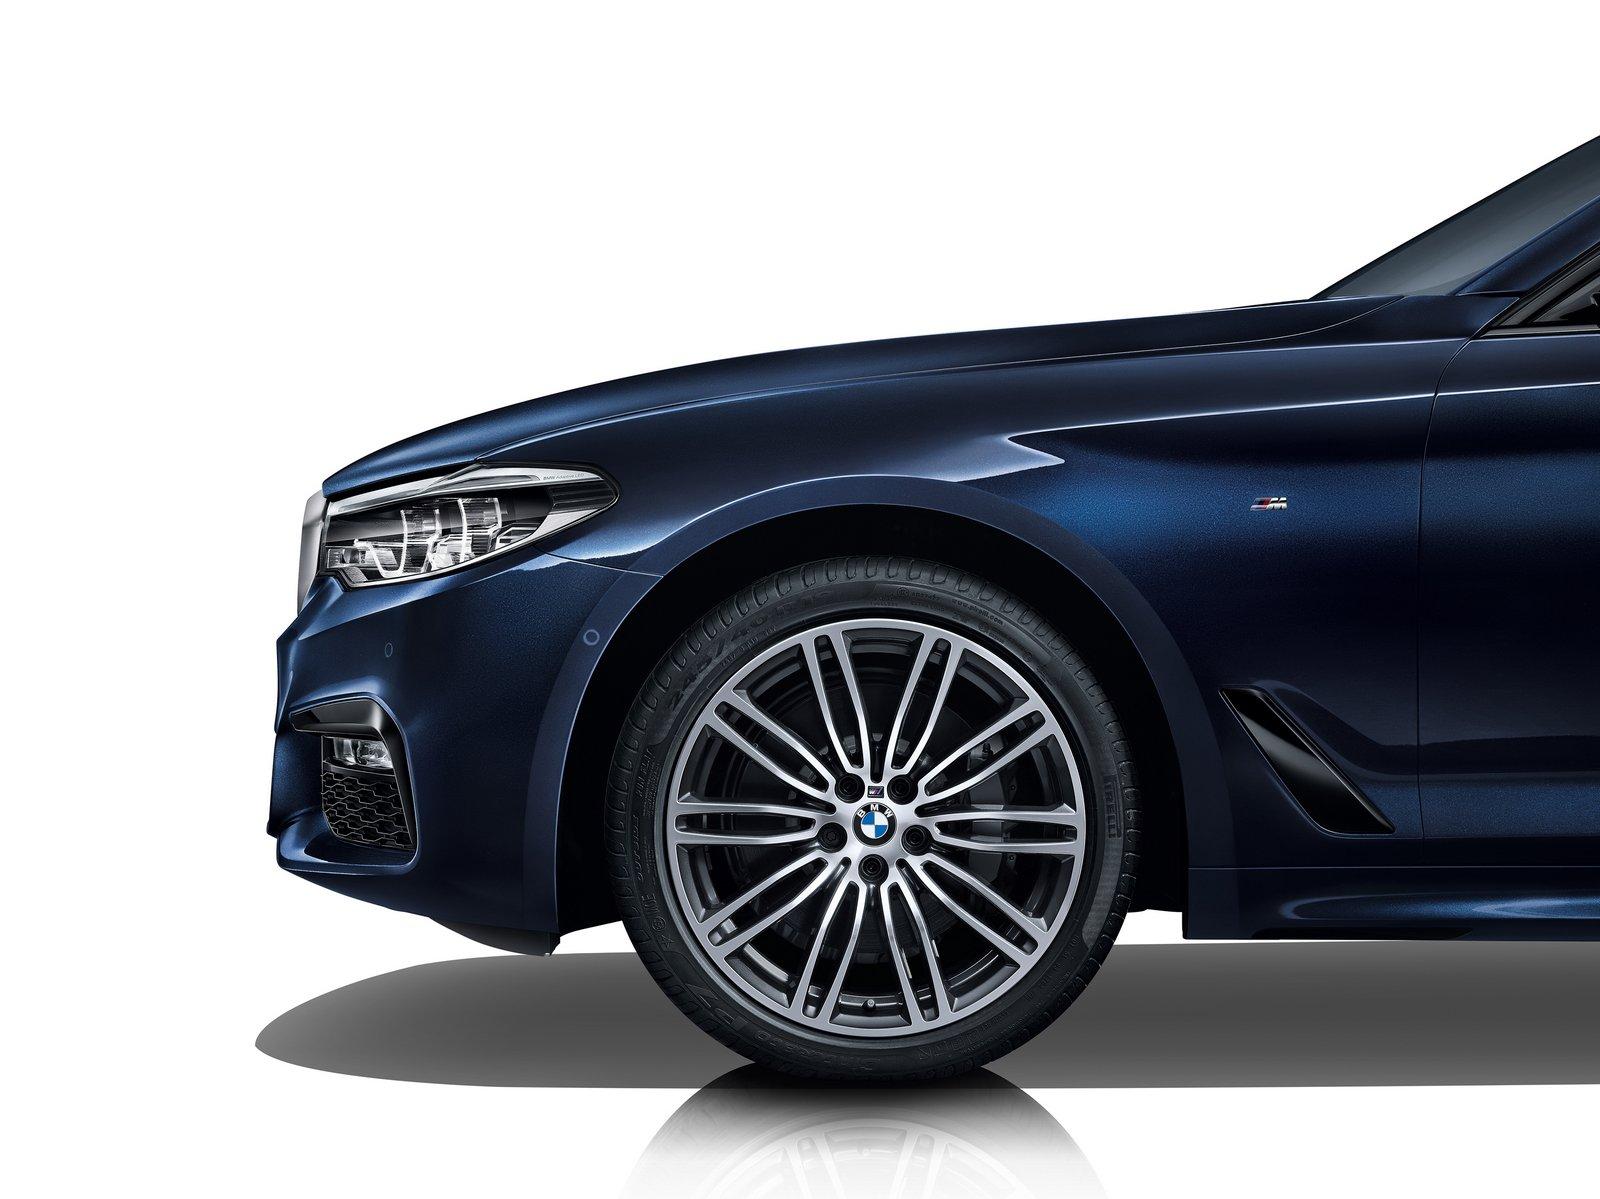 BMW-5-Series-LWB-11.jpg